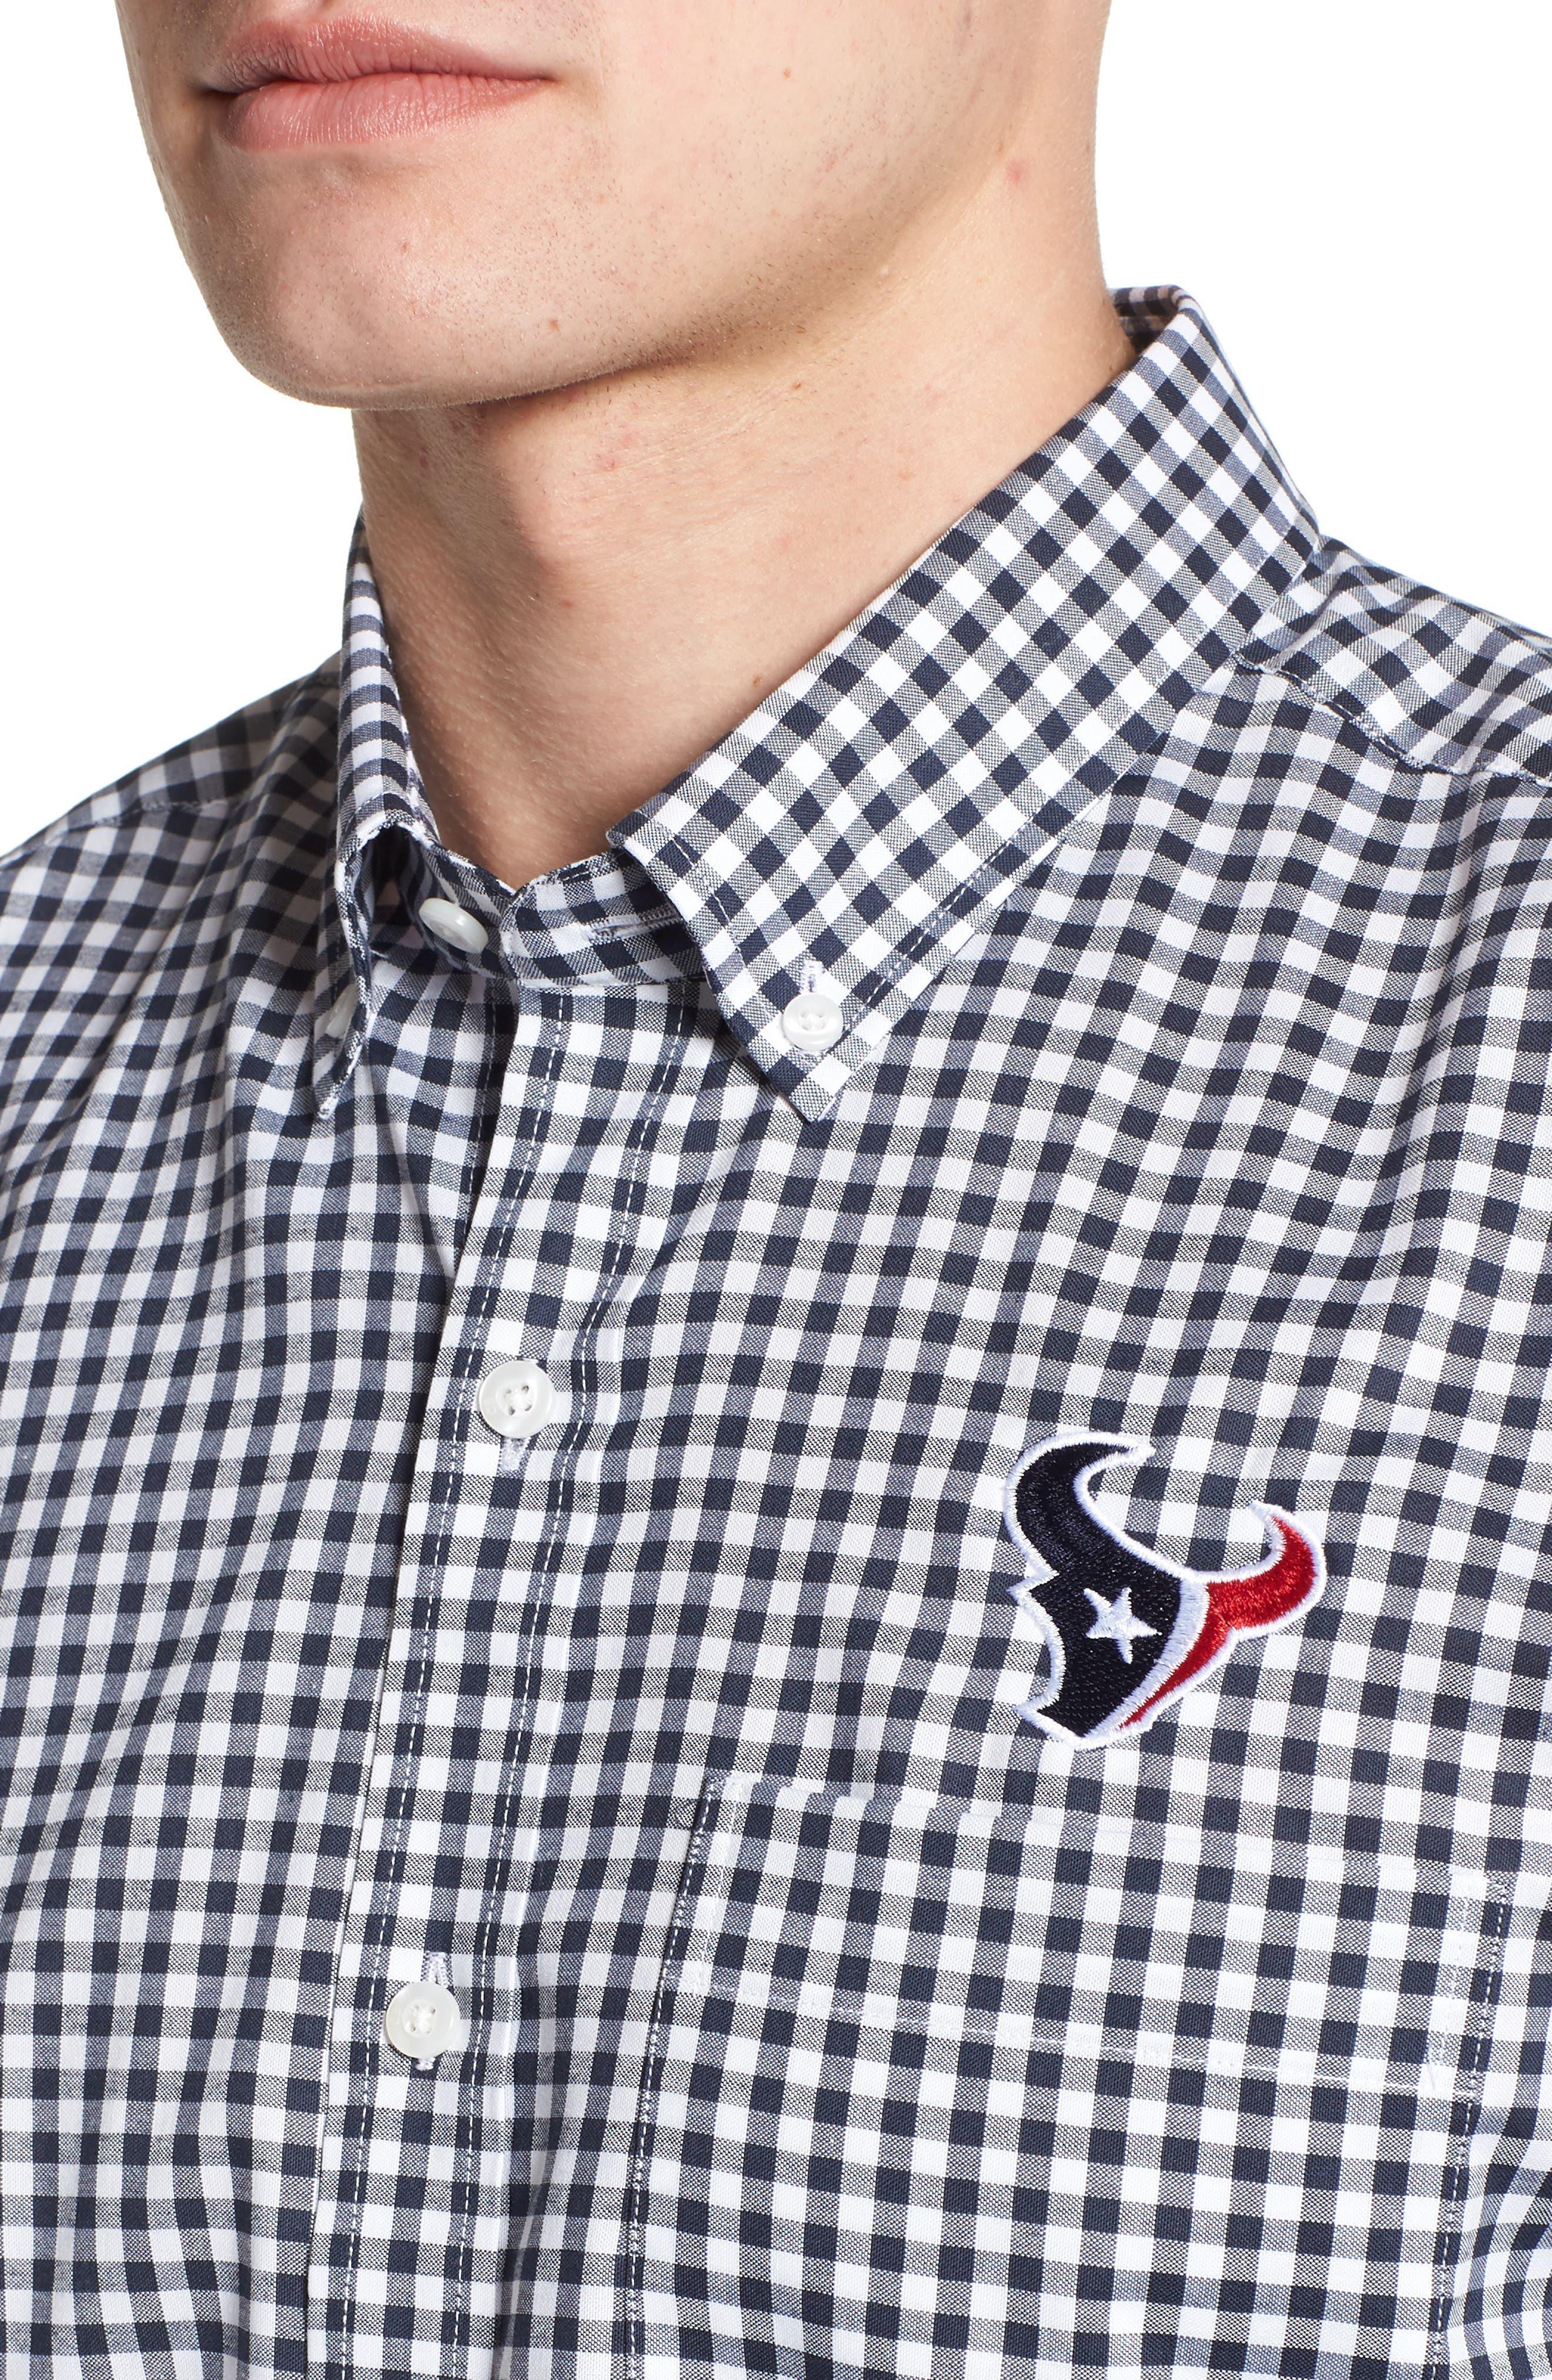 League Houston Texans Regular Fit Shirt,                             Alternate thumbnail 4, color,                             LIBERTY NAVY